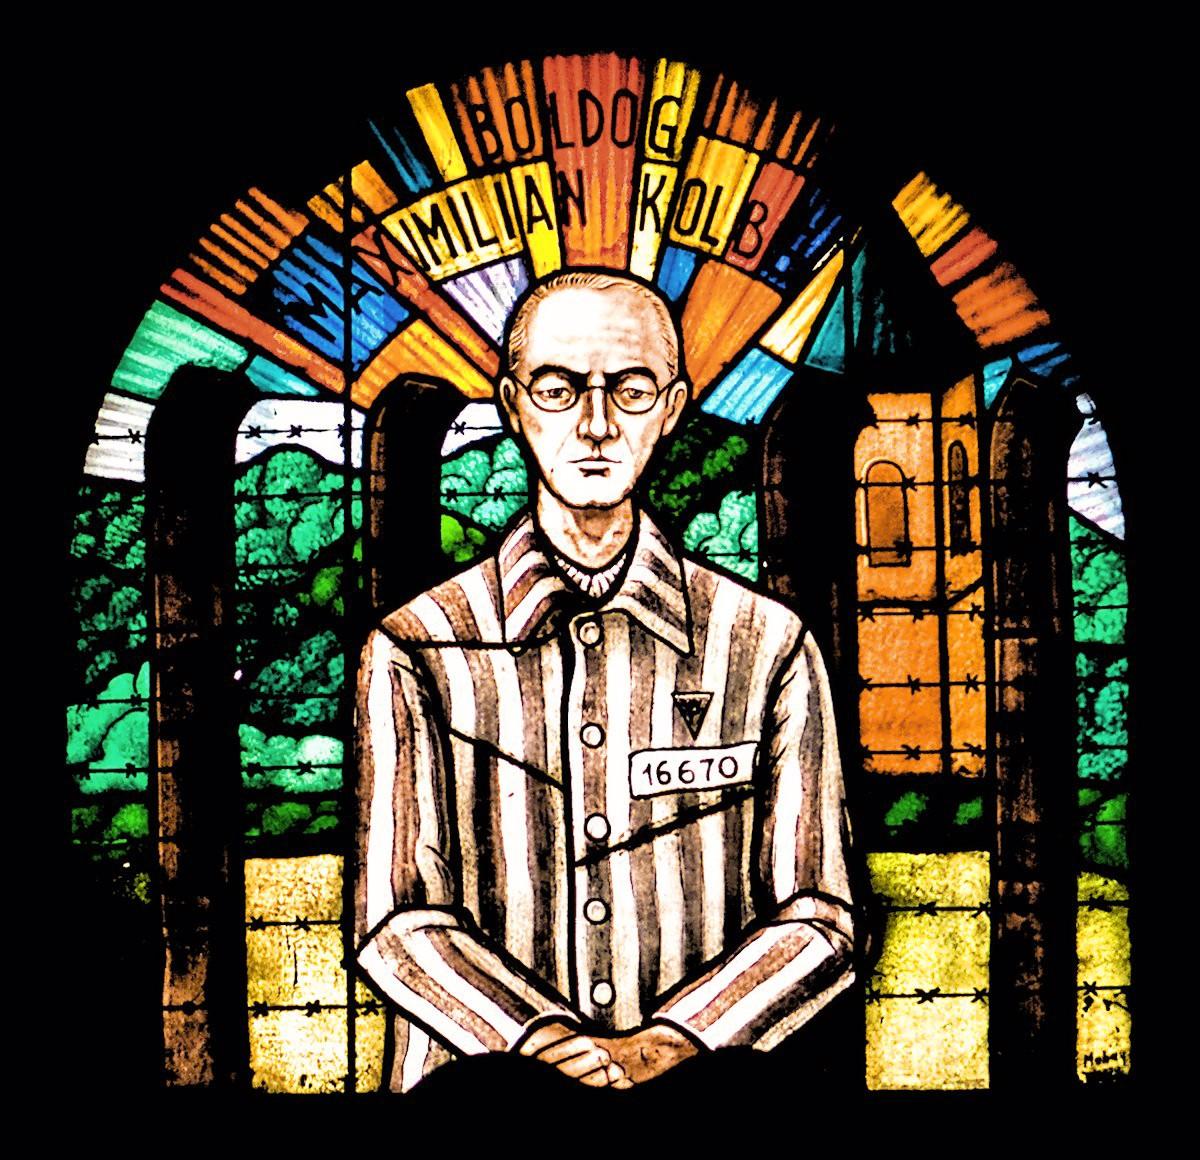 00 St Maximilian Maria Kolbe. Hungary. Auschwitz. 27.01.13